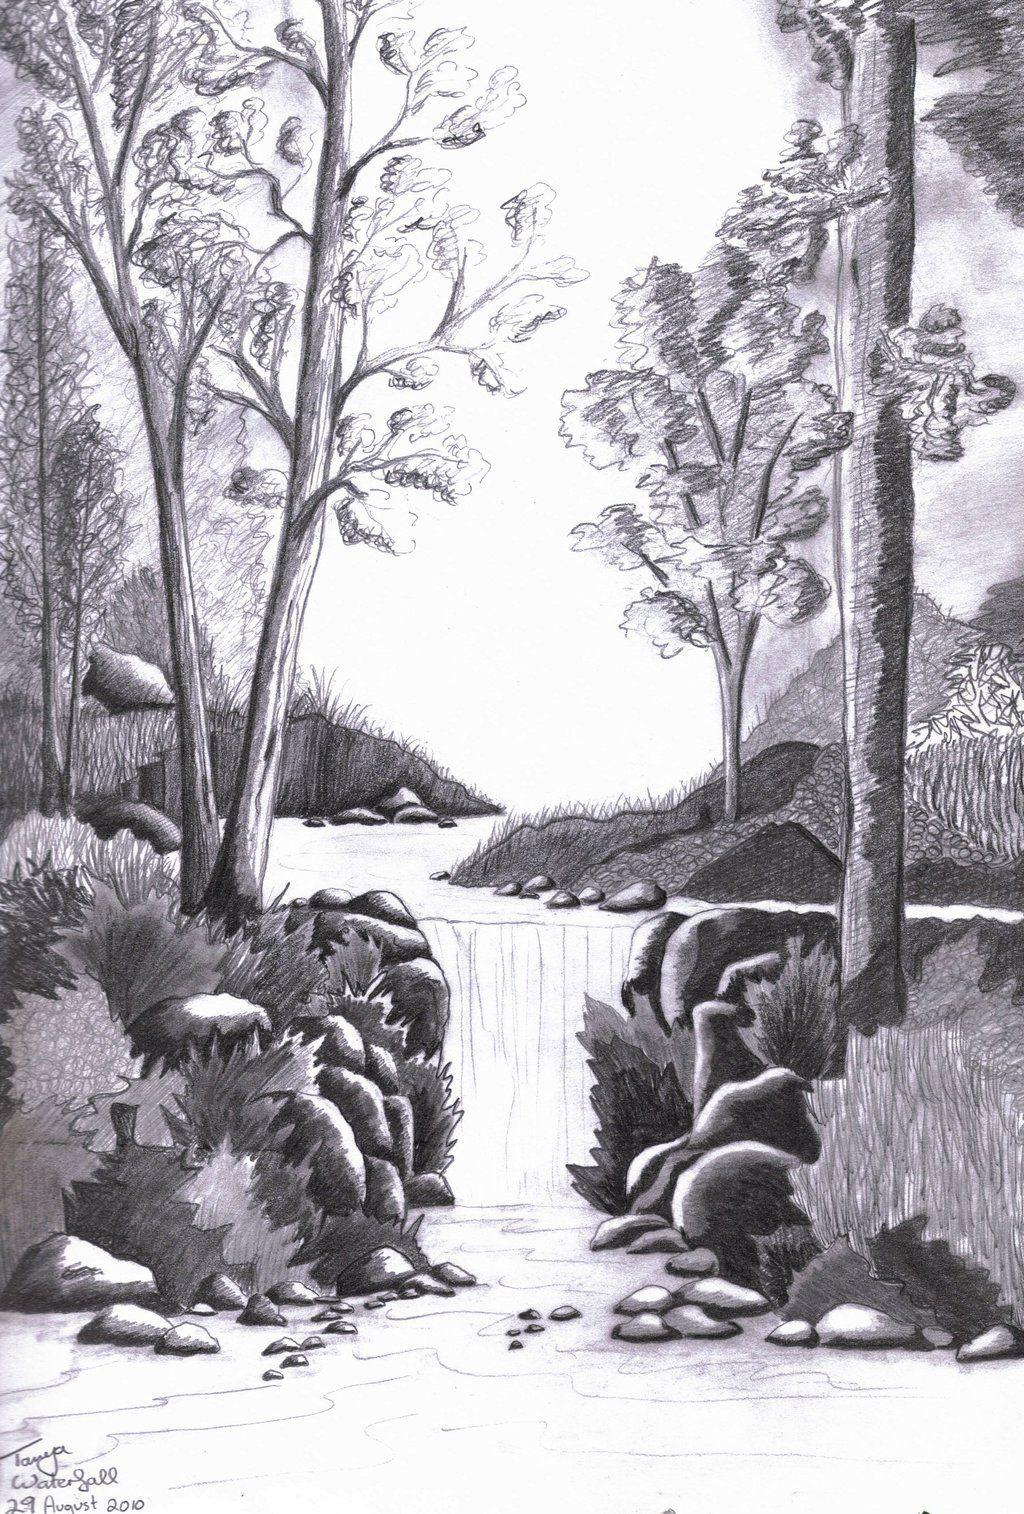 5807ac58b00228c9e0522efd95c4e040 » Realistic Pencil Waterfall